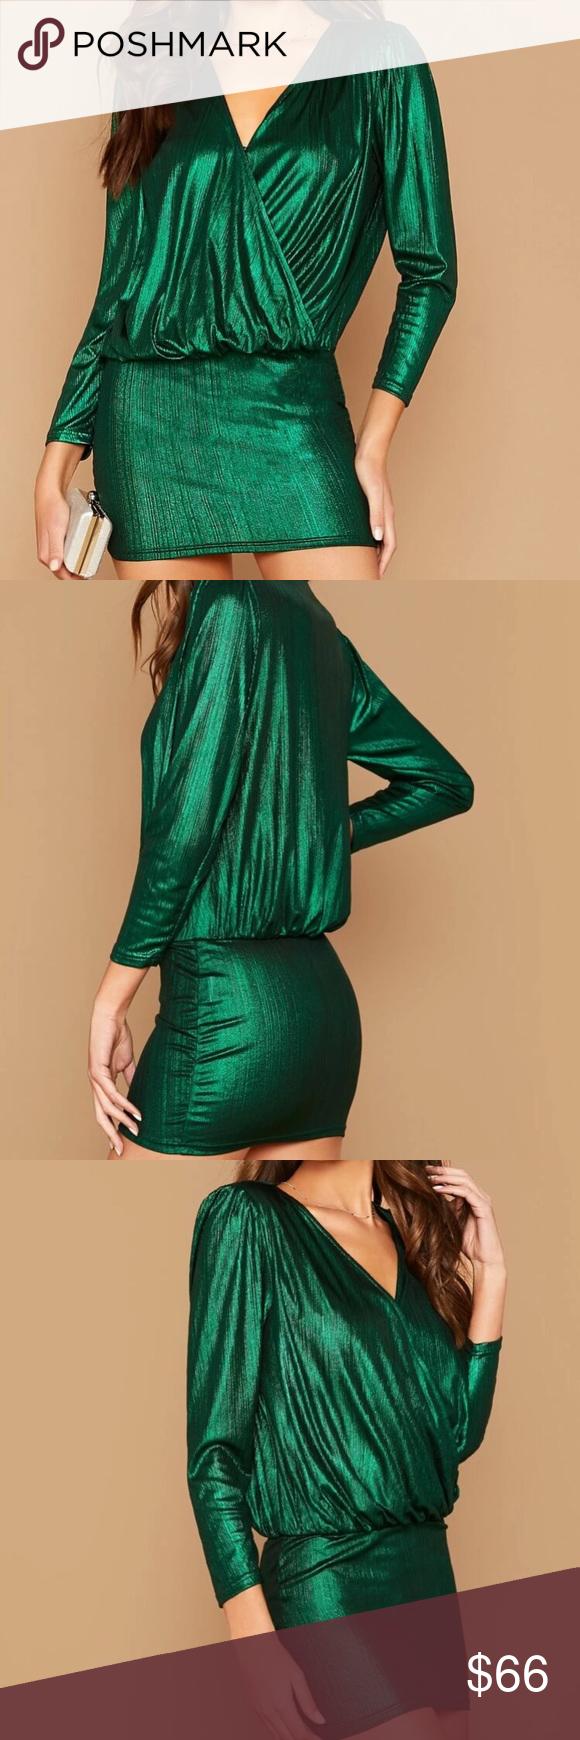 Metallic Dress X M As Green Holiday Womens Dresses Metallic Dress Dresses [ 1740 x 580 Pixel ]